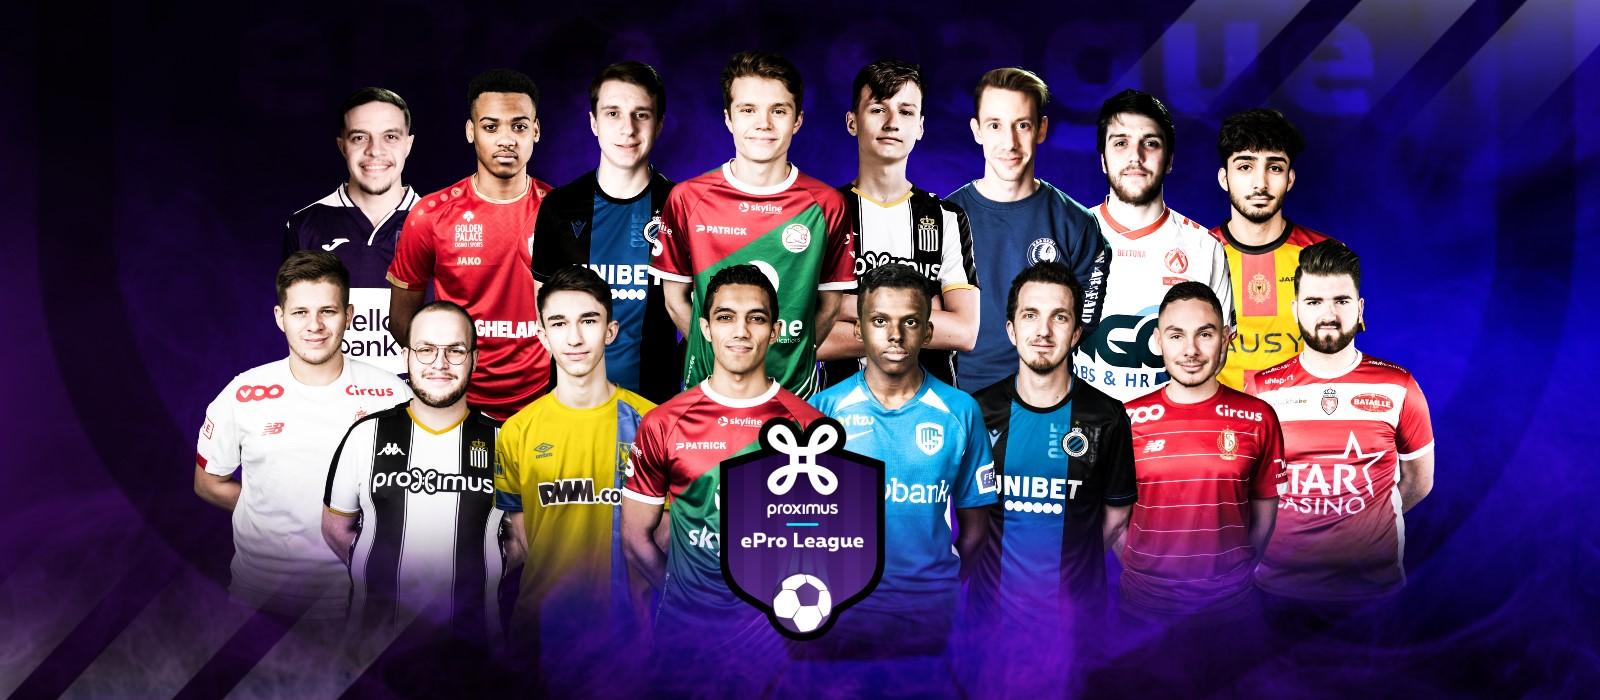 Play-offs Proximus ePro League